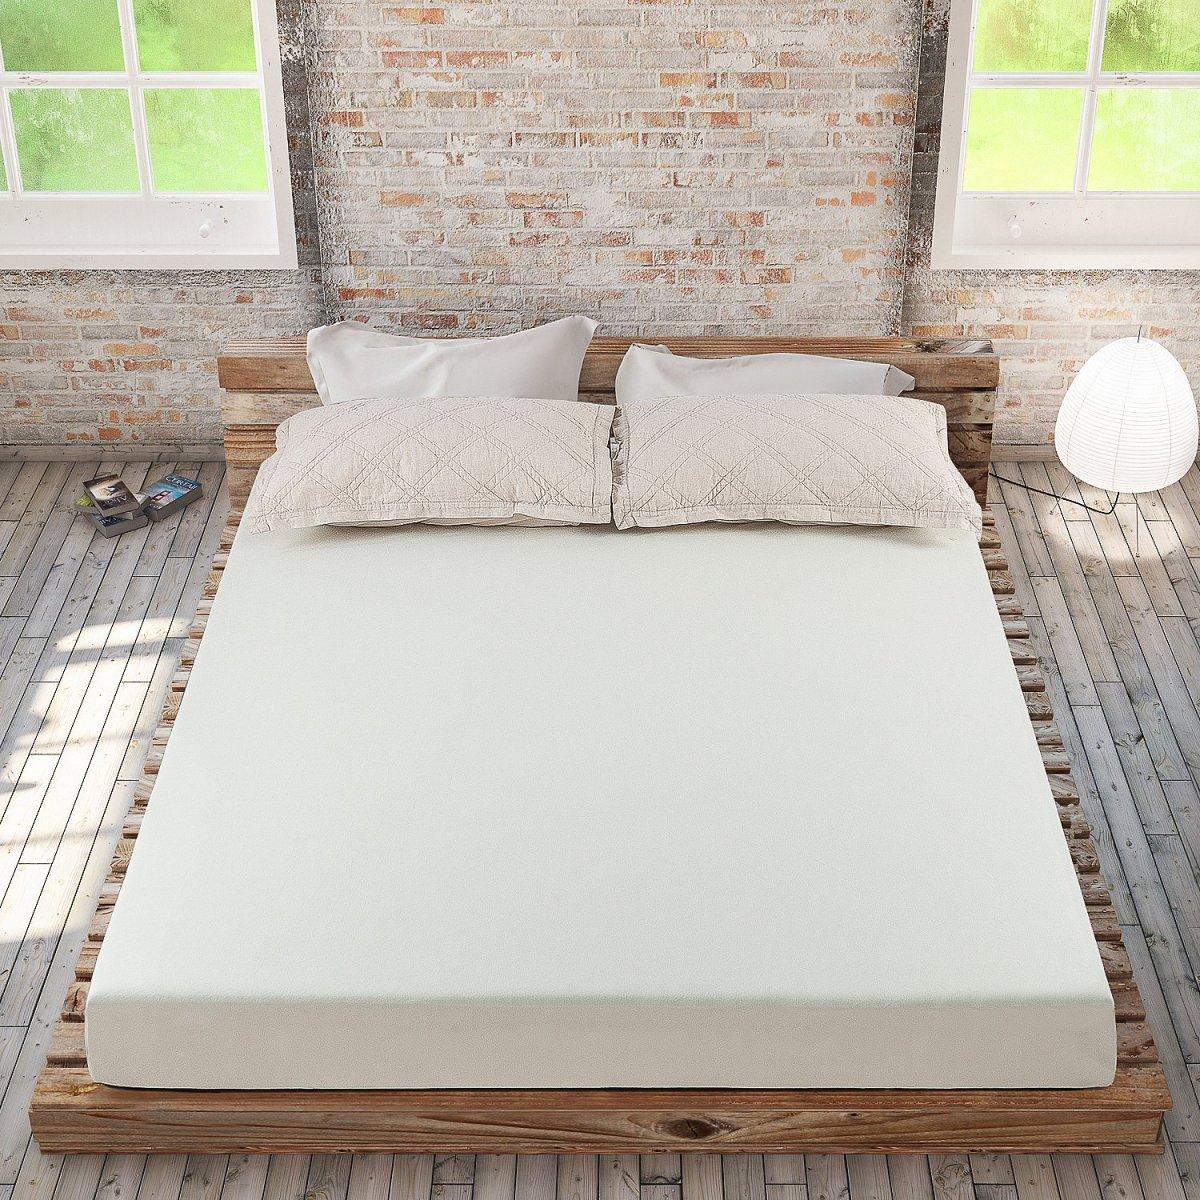 flyer sale mattress brick the friday on black nov november page